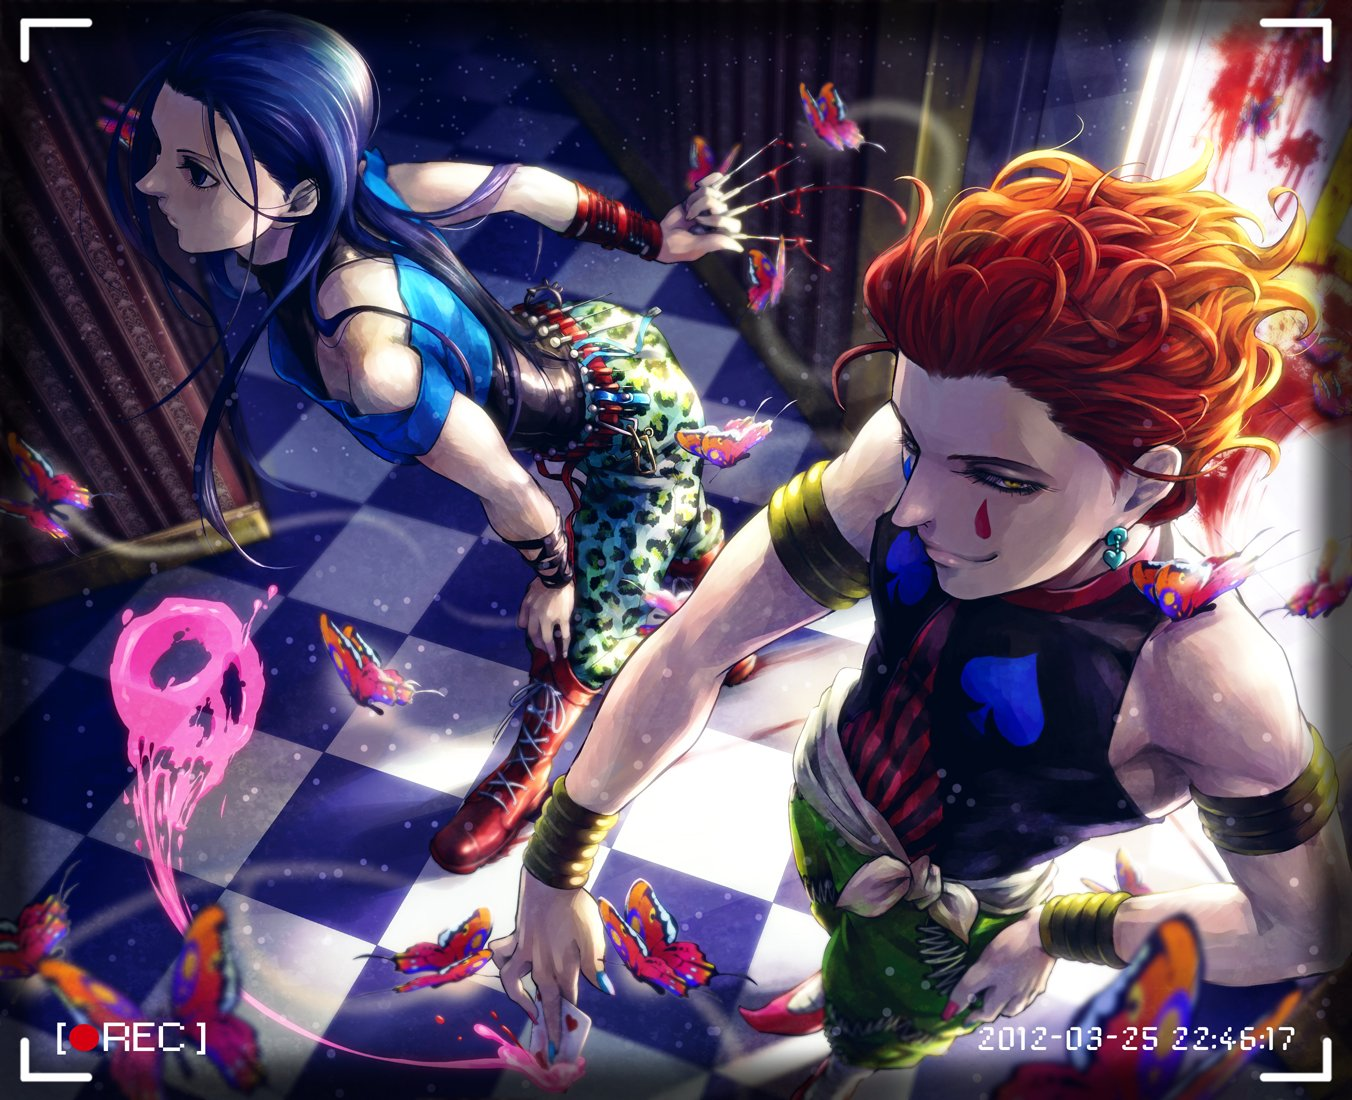 Fonds d'écran Manga Hunter x Hunter